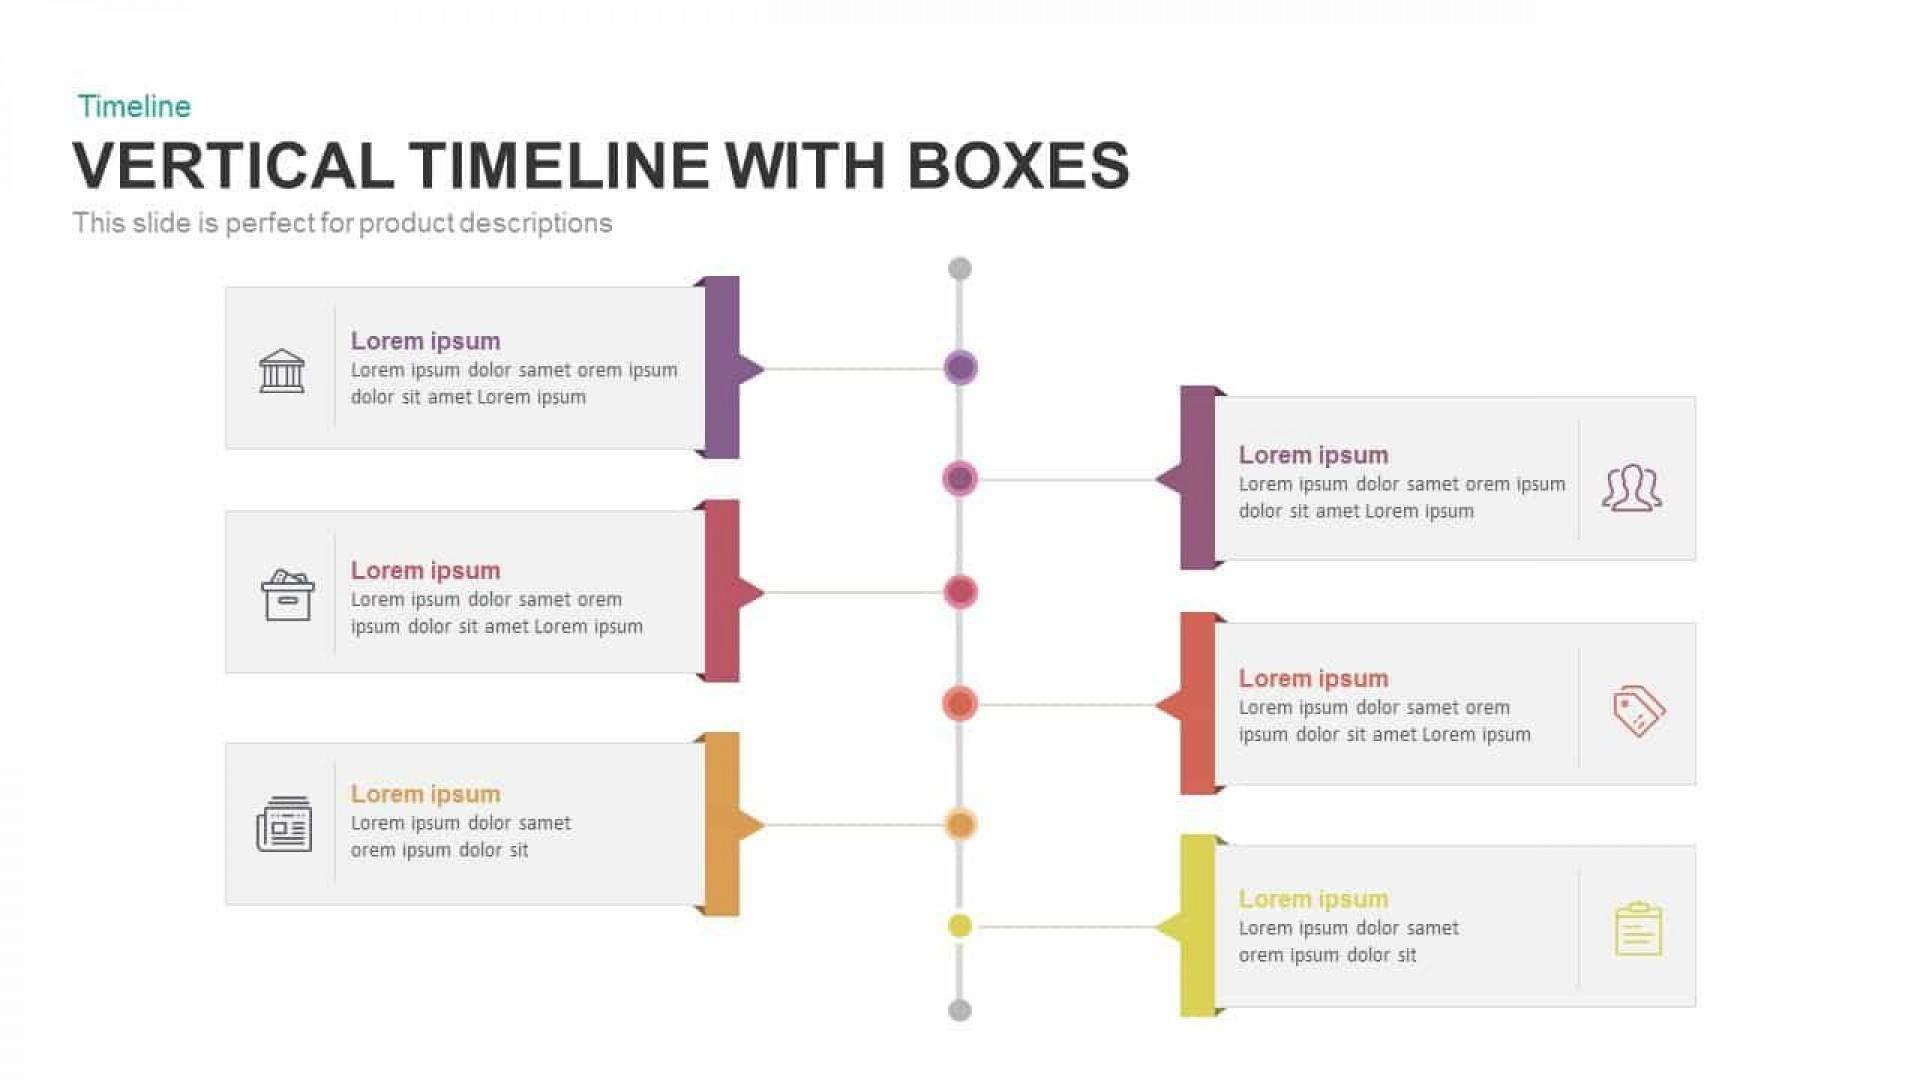 009 Impressive Timeline Template For Powerpoint Inspiration  Presentation Project Management Mac1920